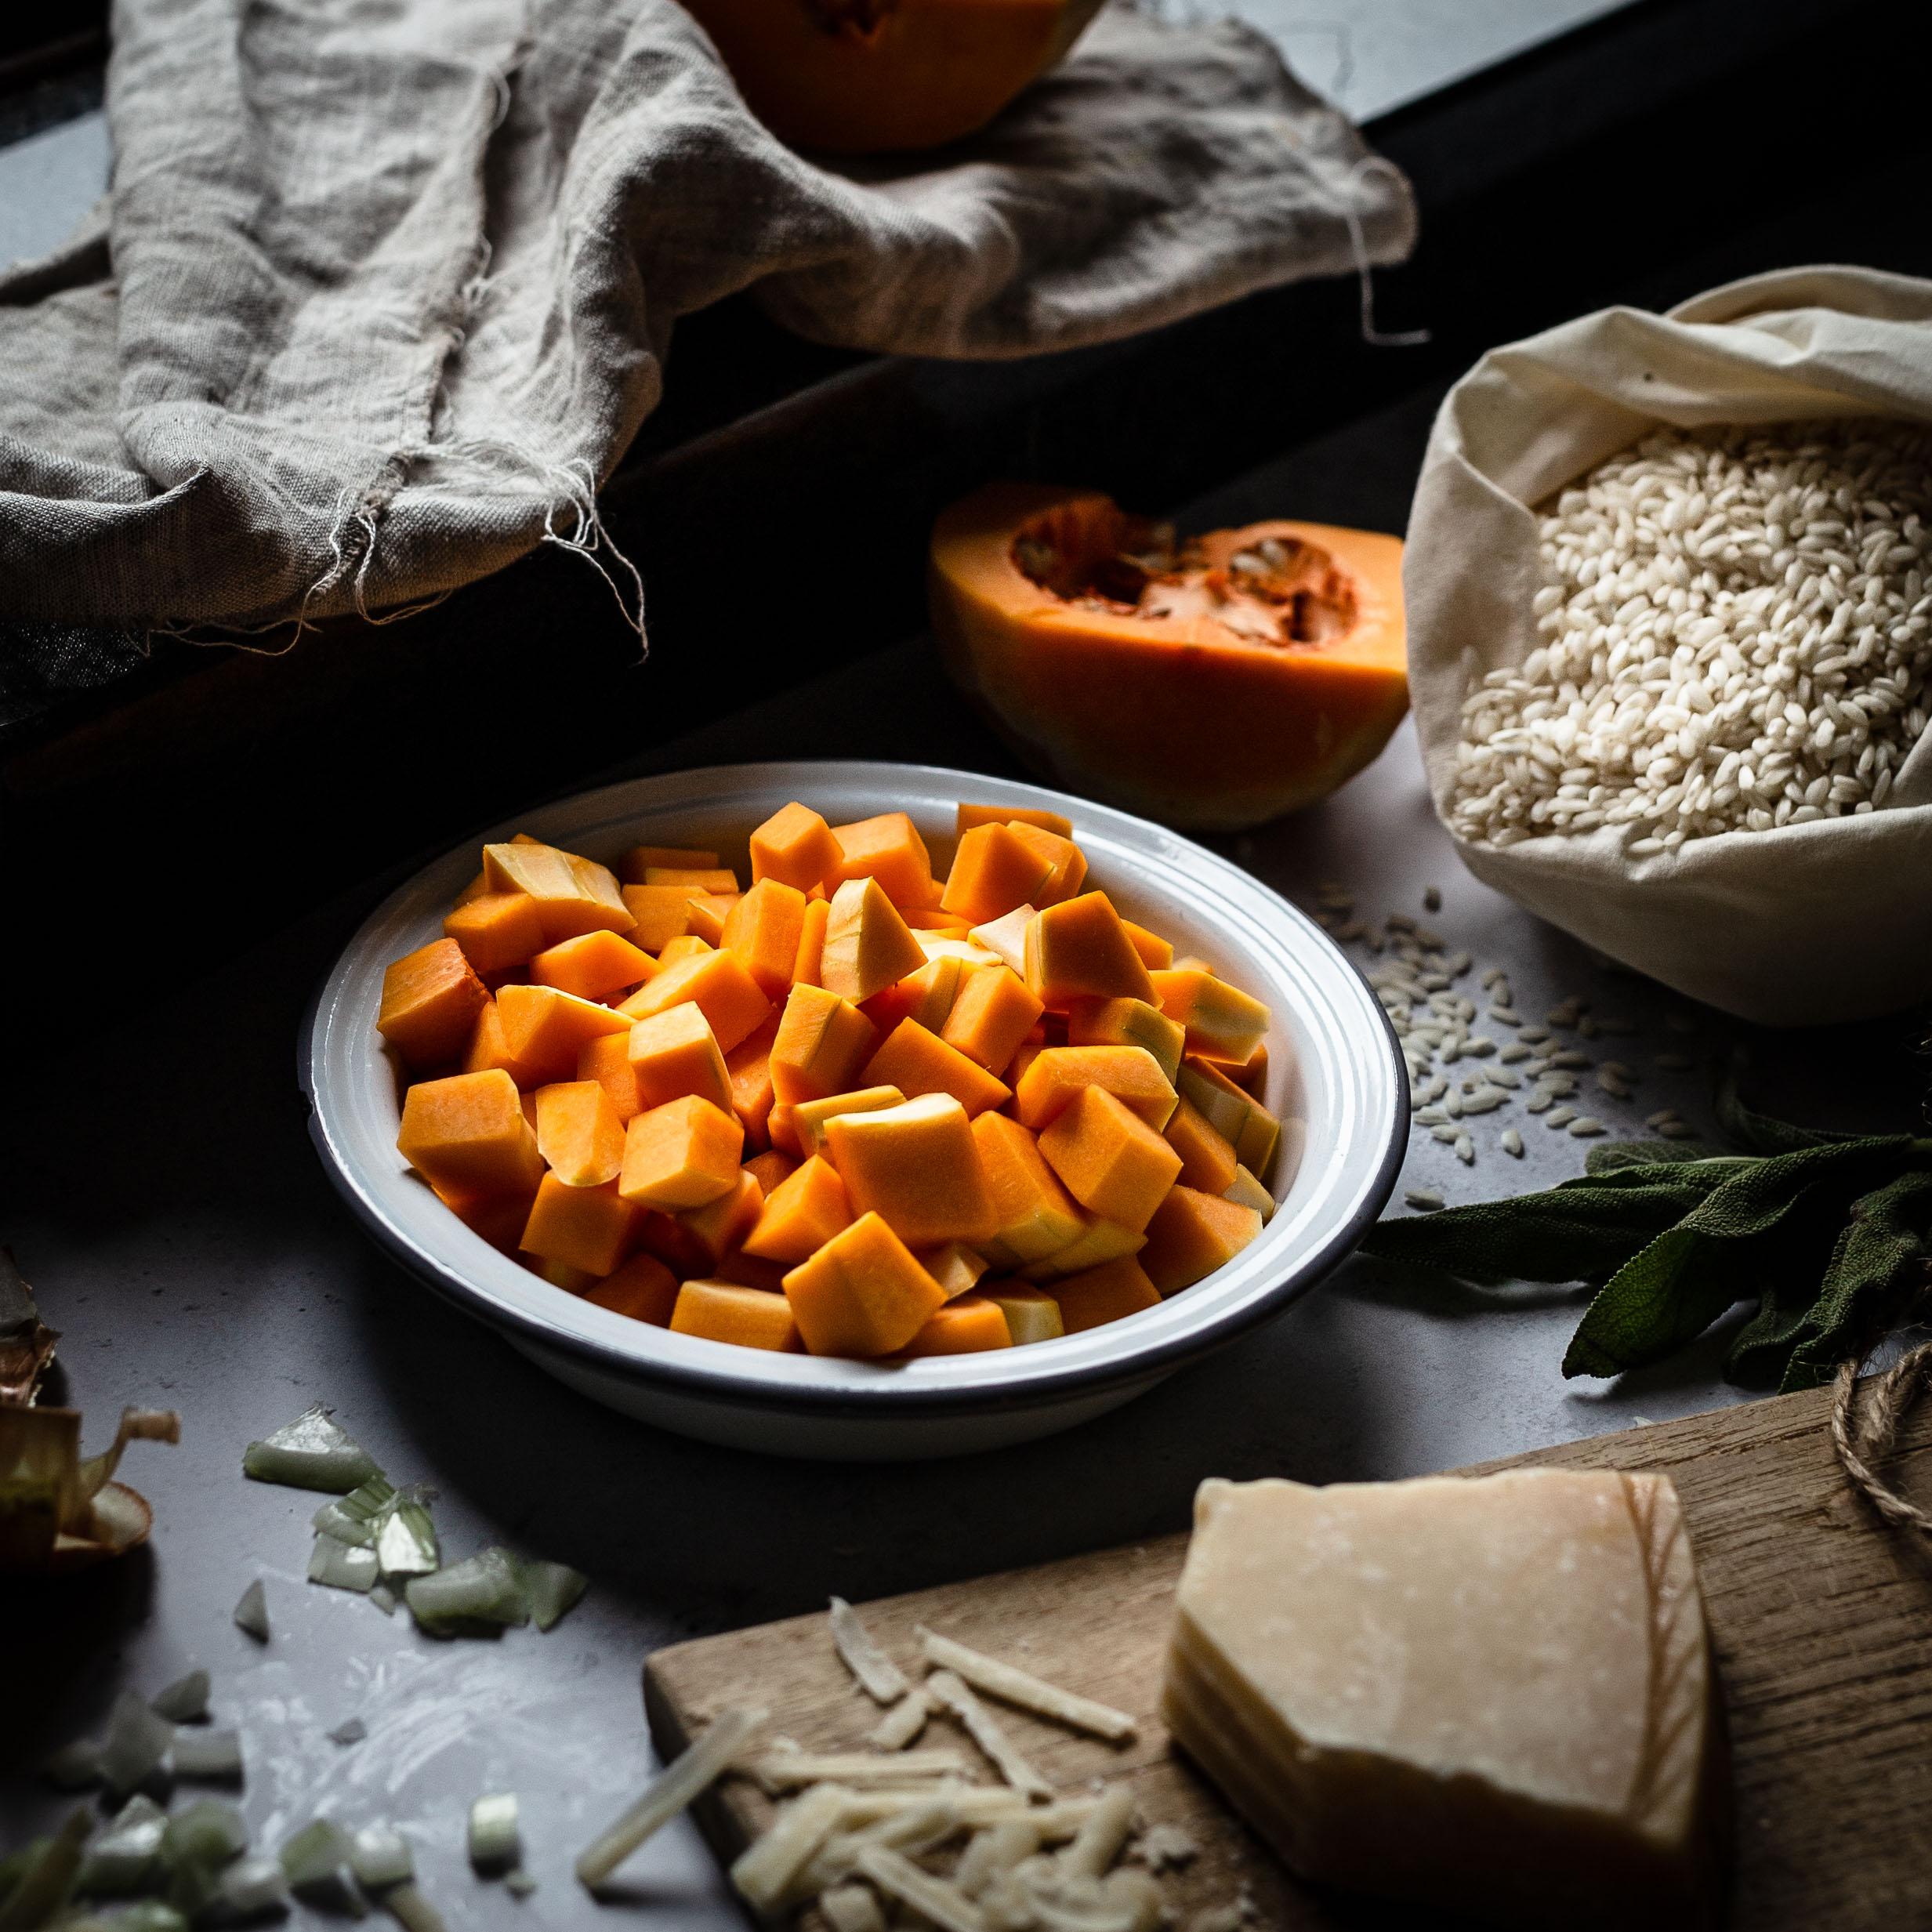 Kürbis Parmesan Foodstyling